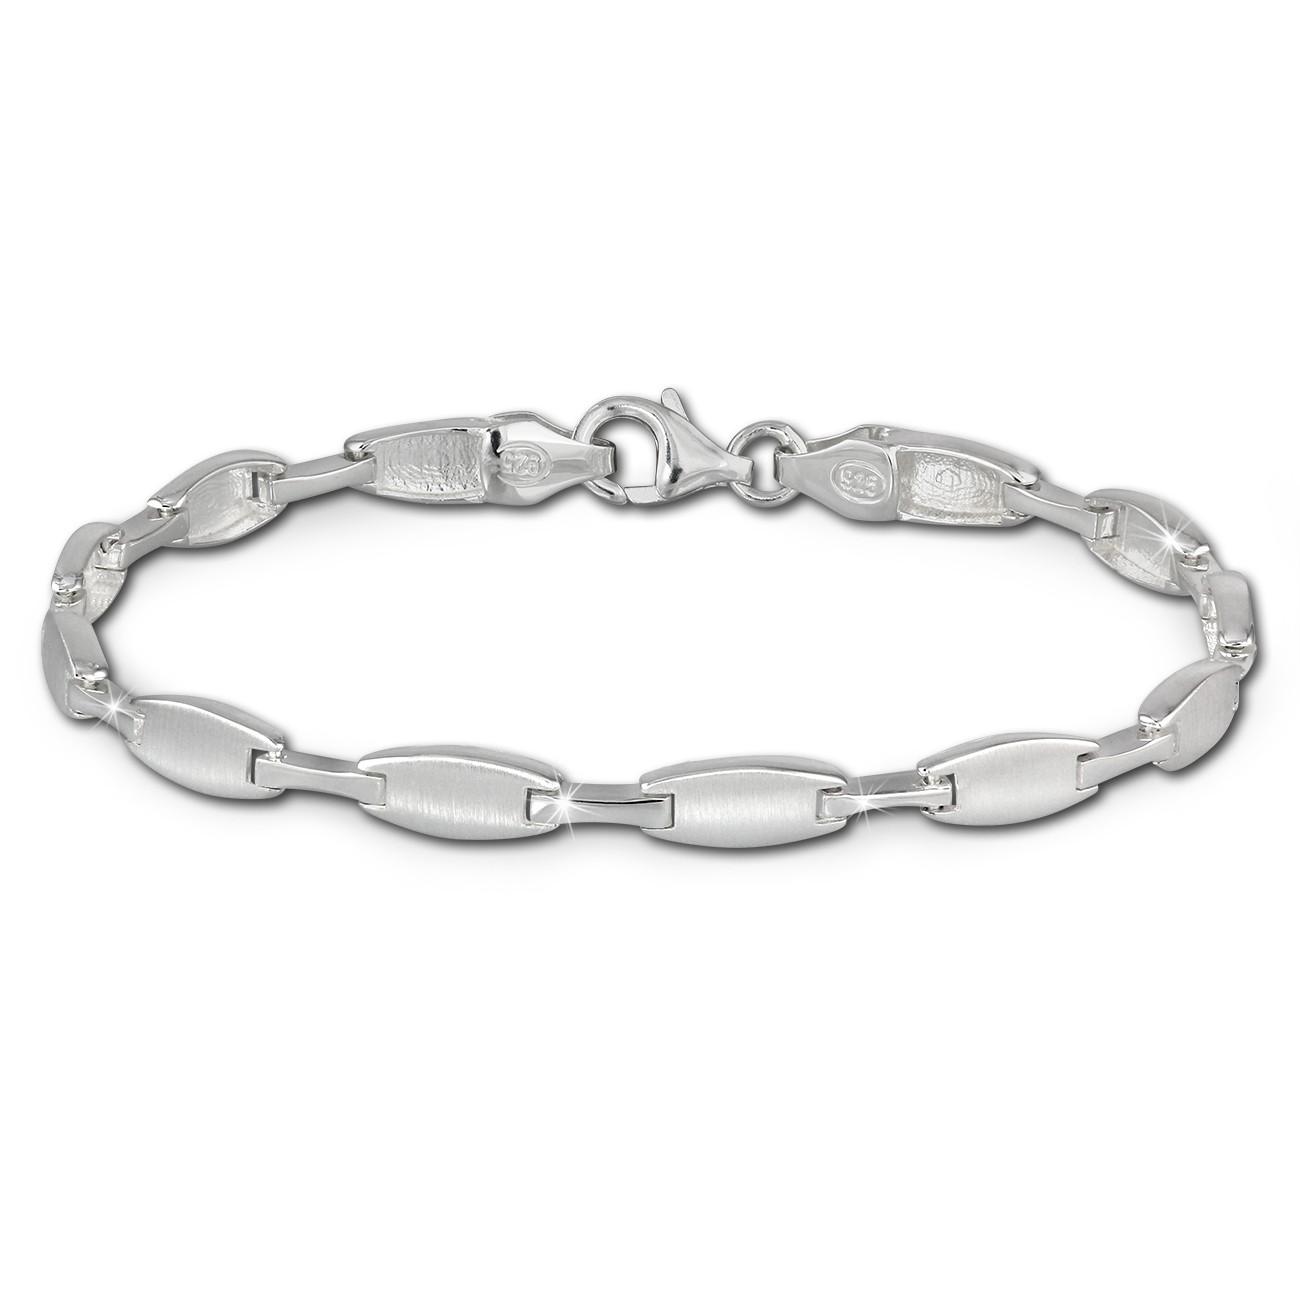 SilberDream Armband Style matt/glänzend 925 Sterling Silber 19cm SDA429